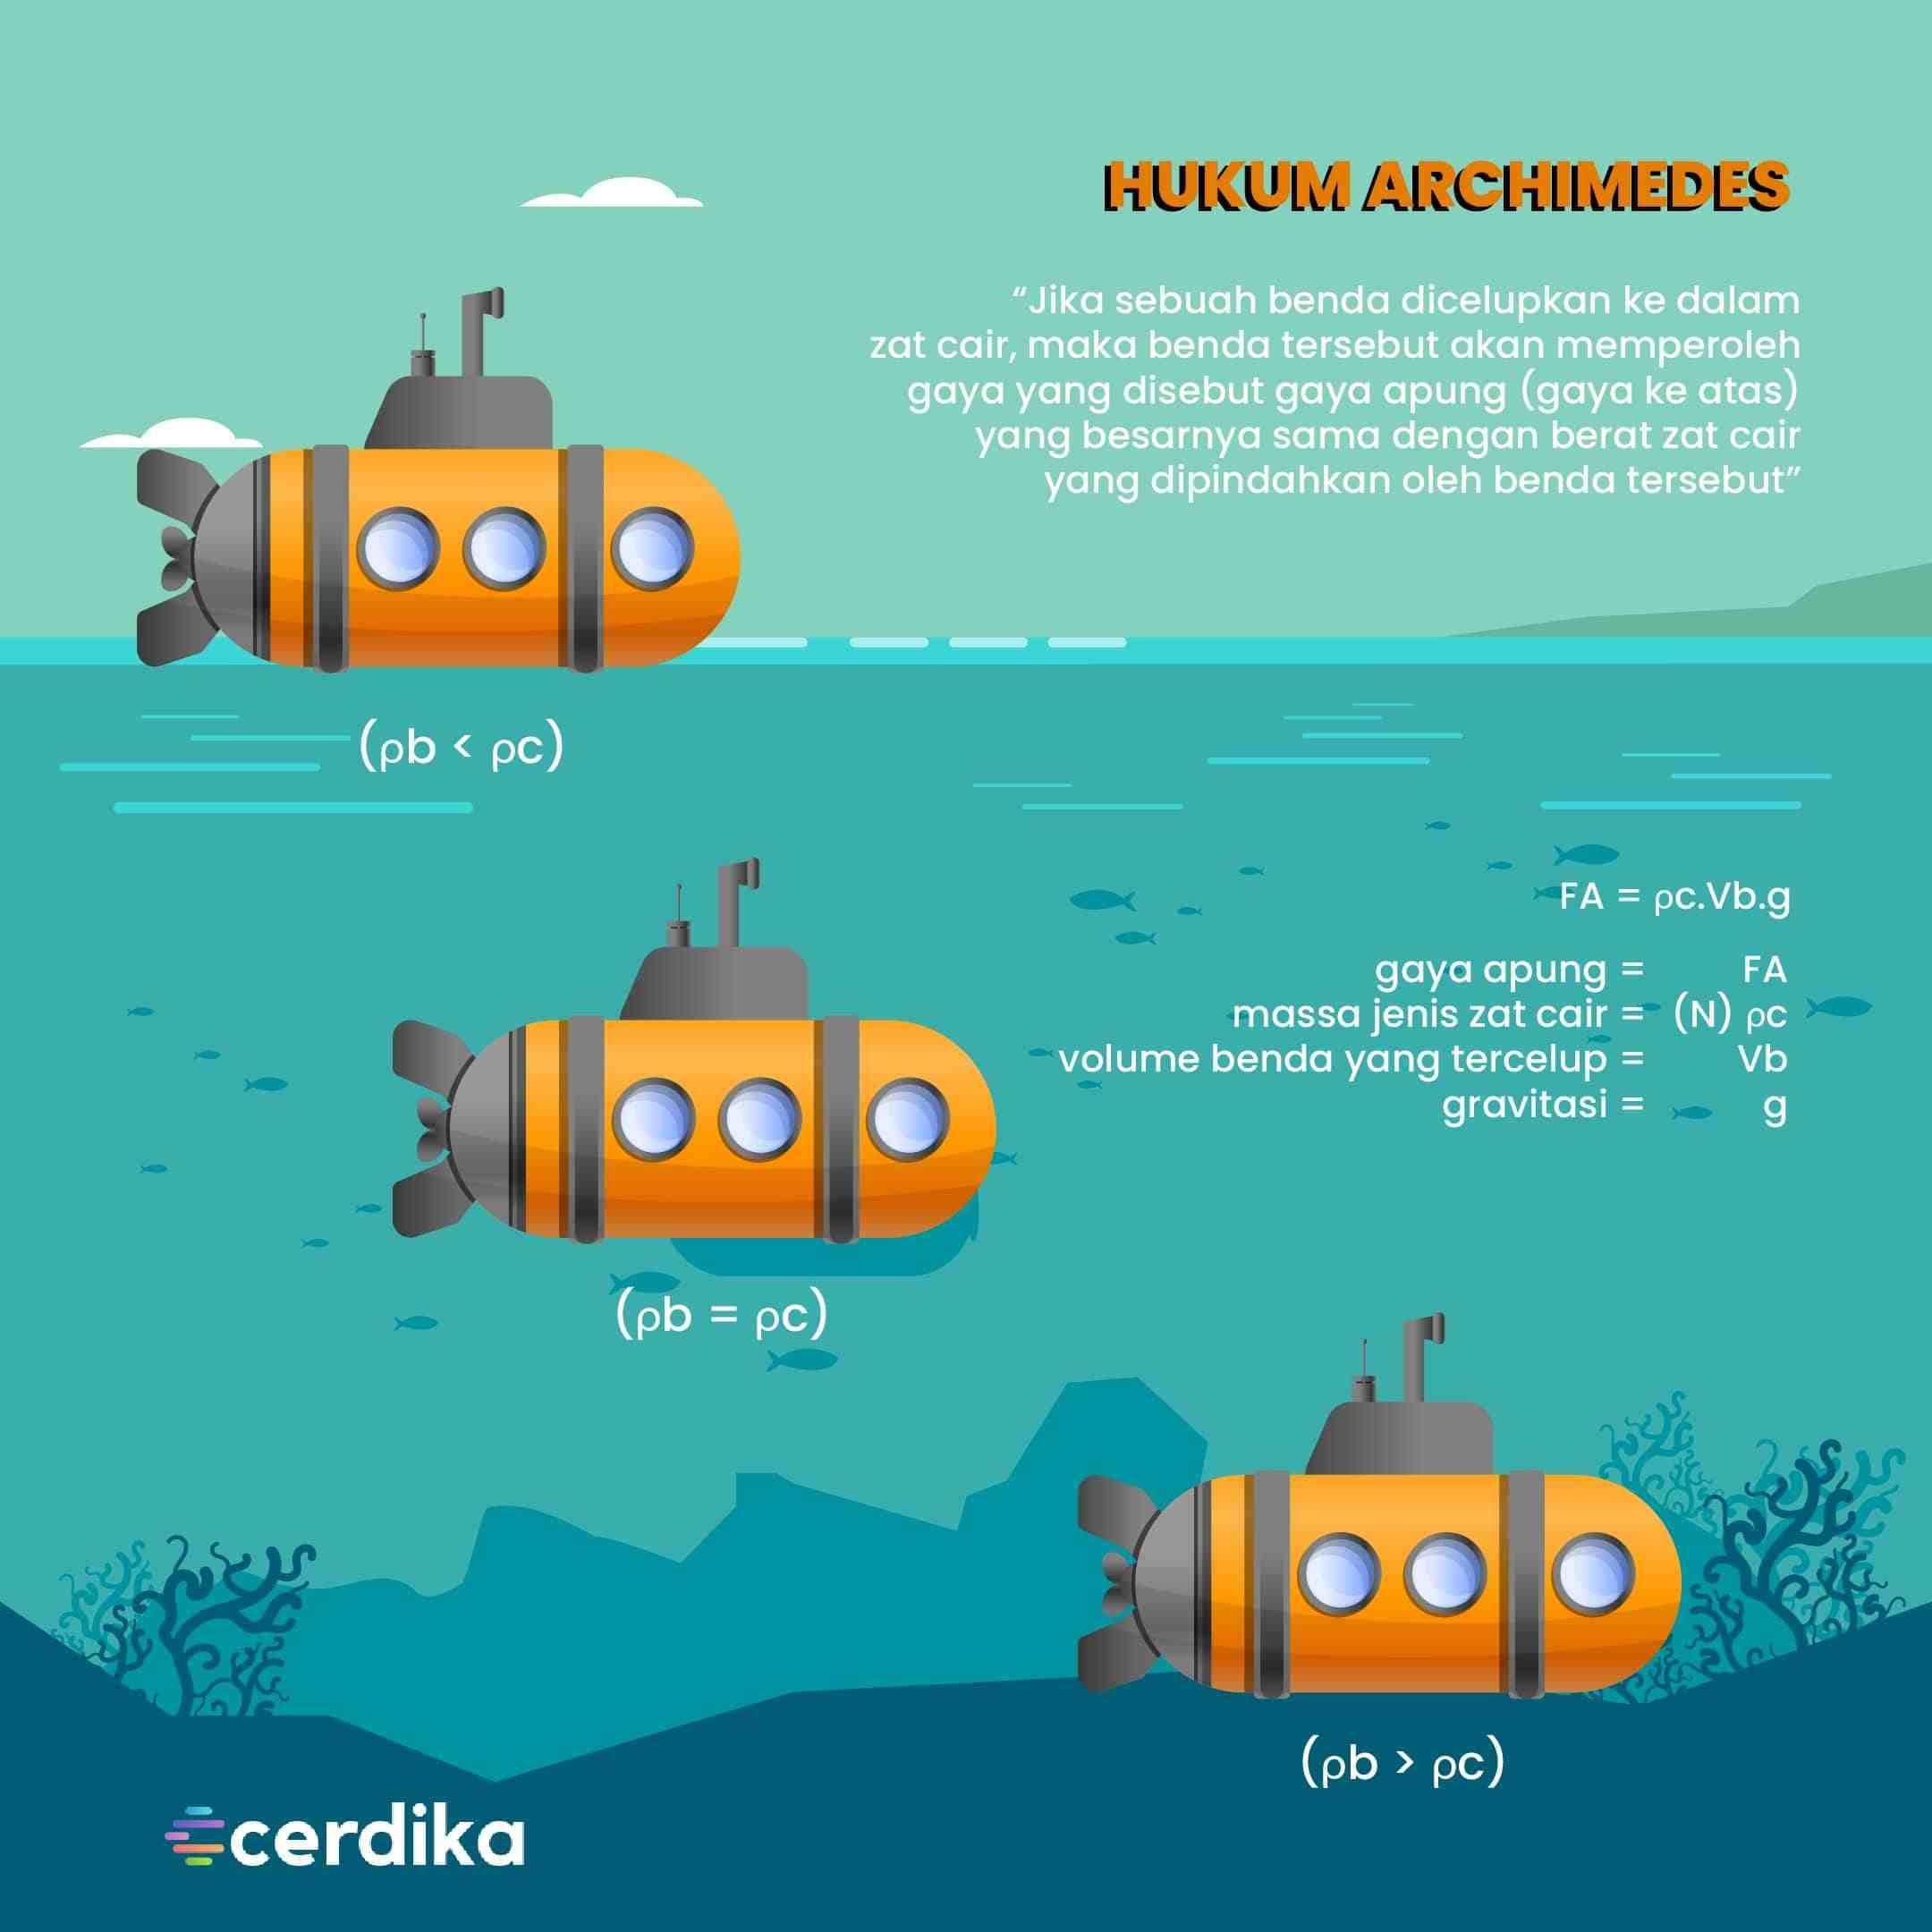 infografis hukum archimedes